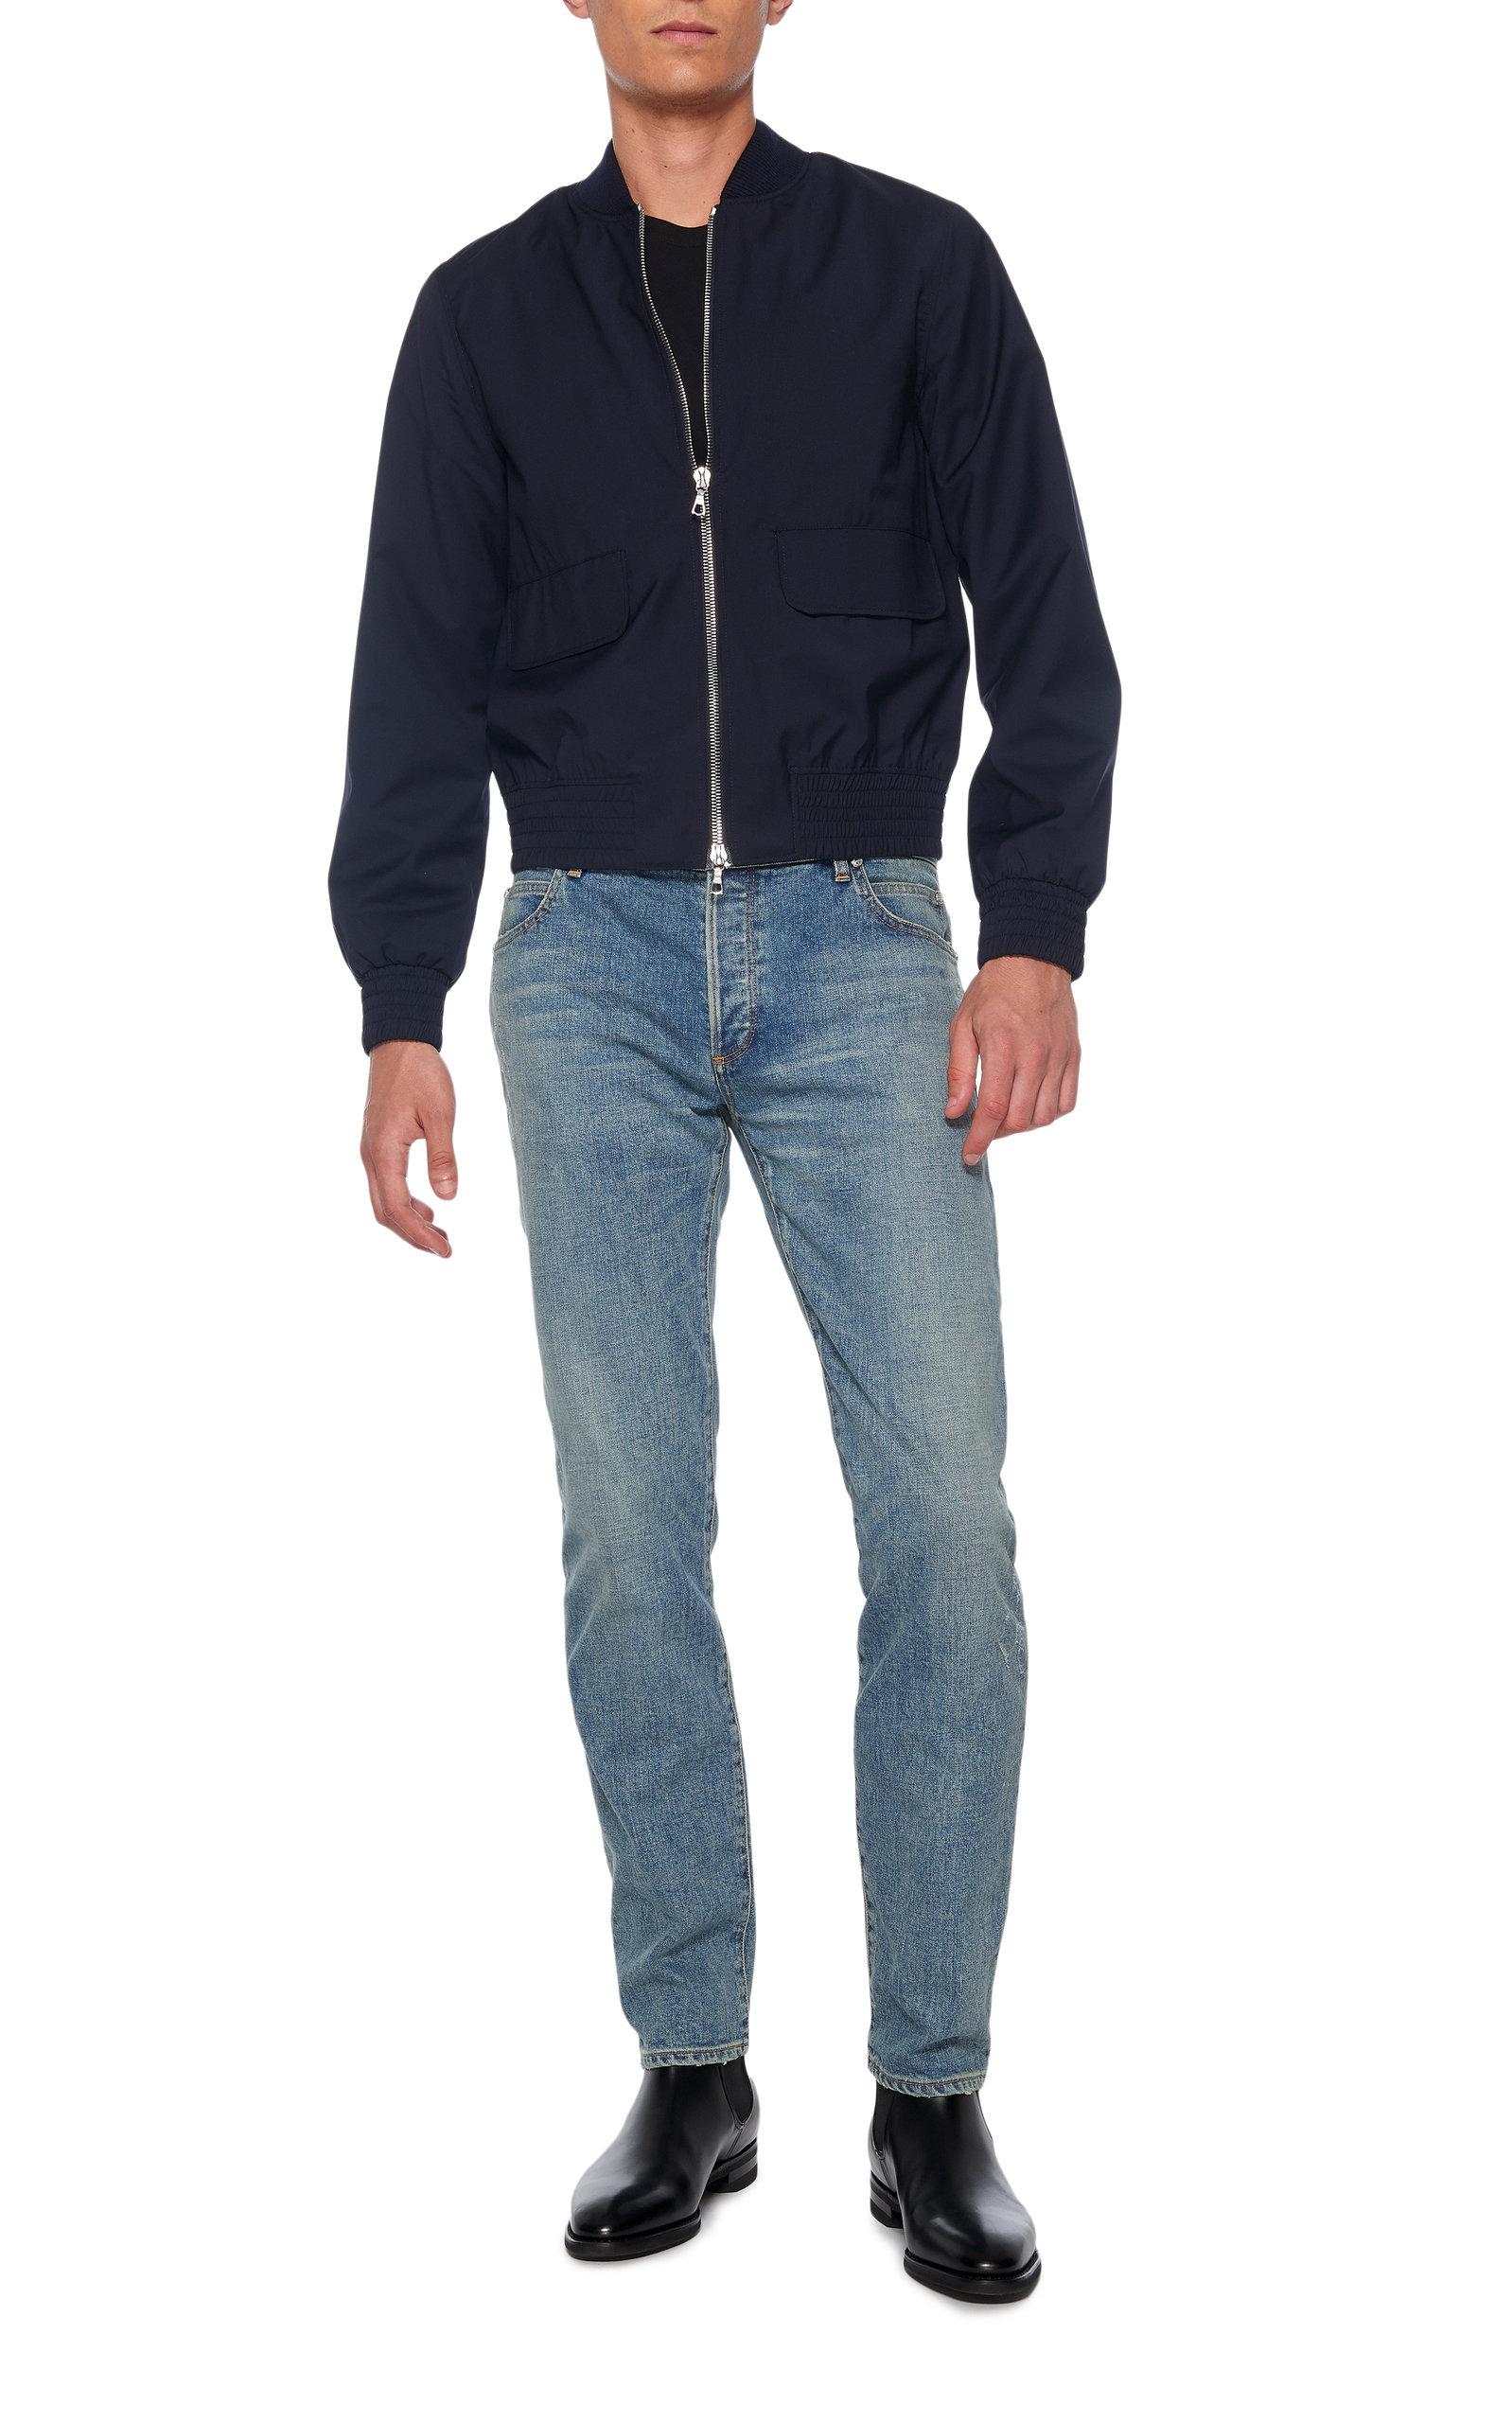 074adec5 Bleached Slim-Fit Jeans by Balmain | Moda Operandi